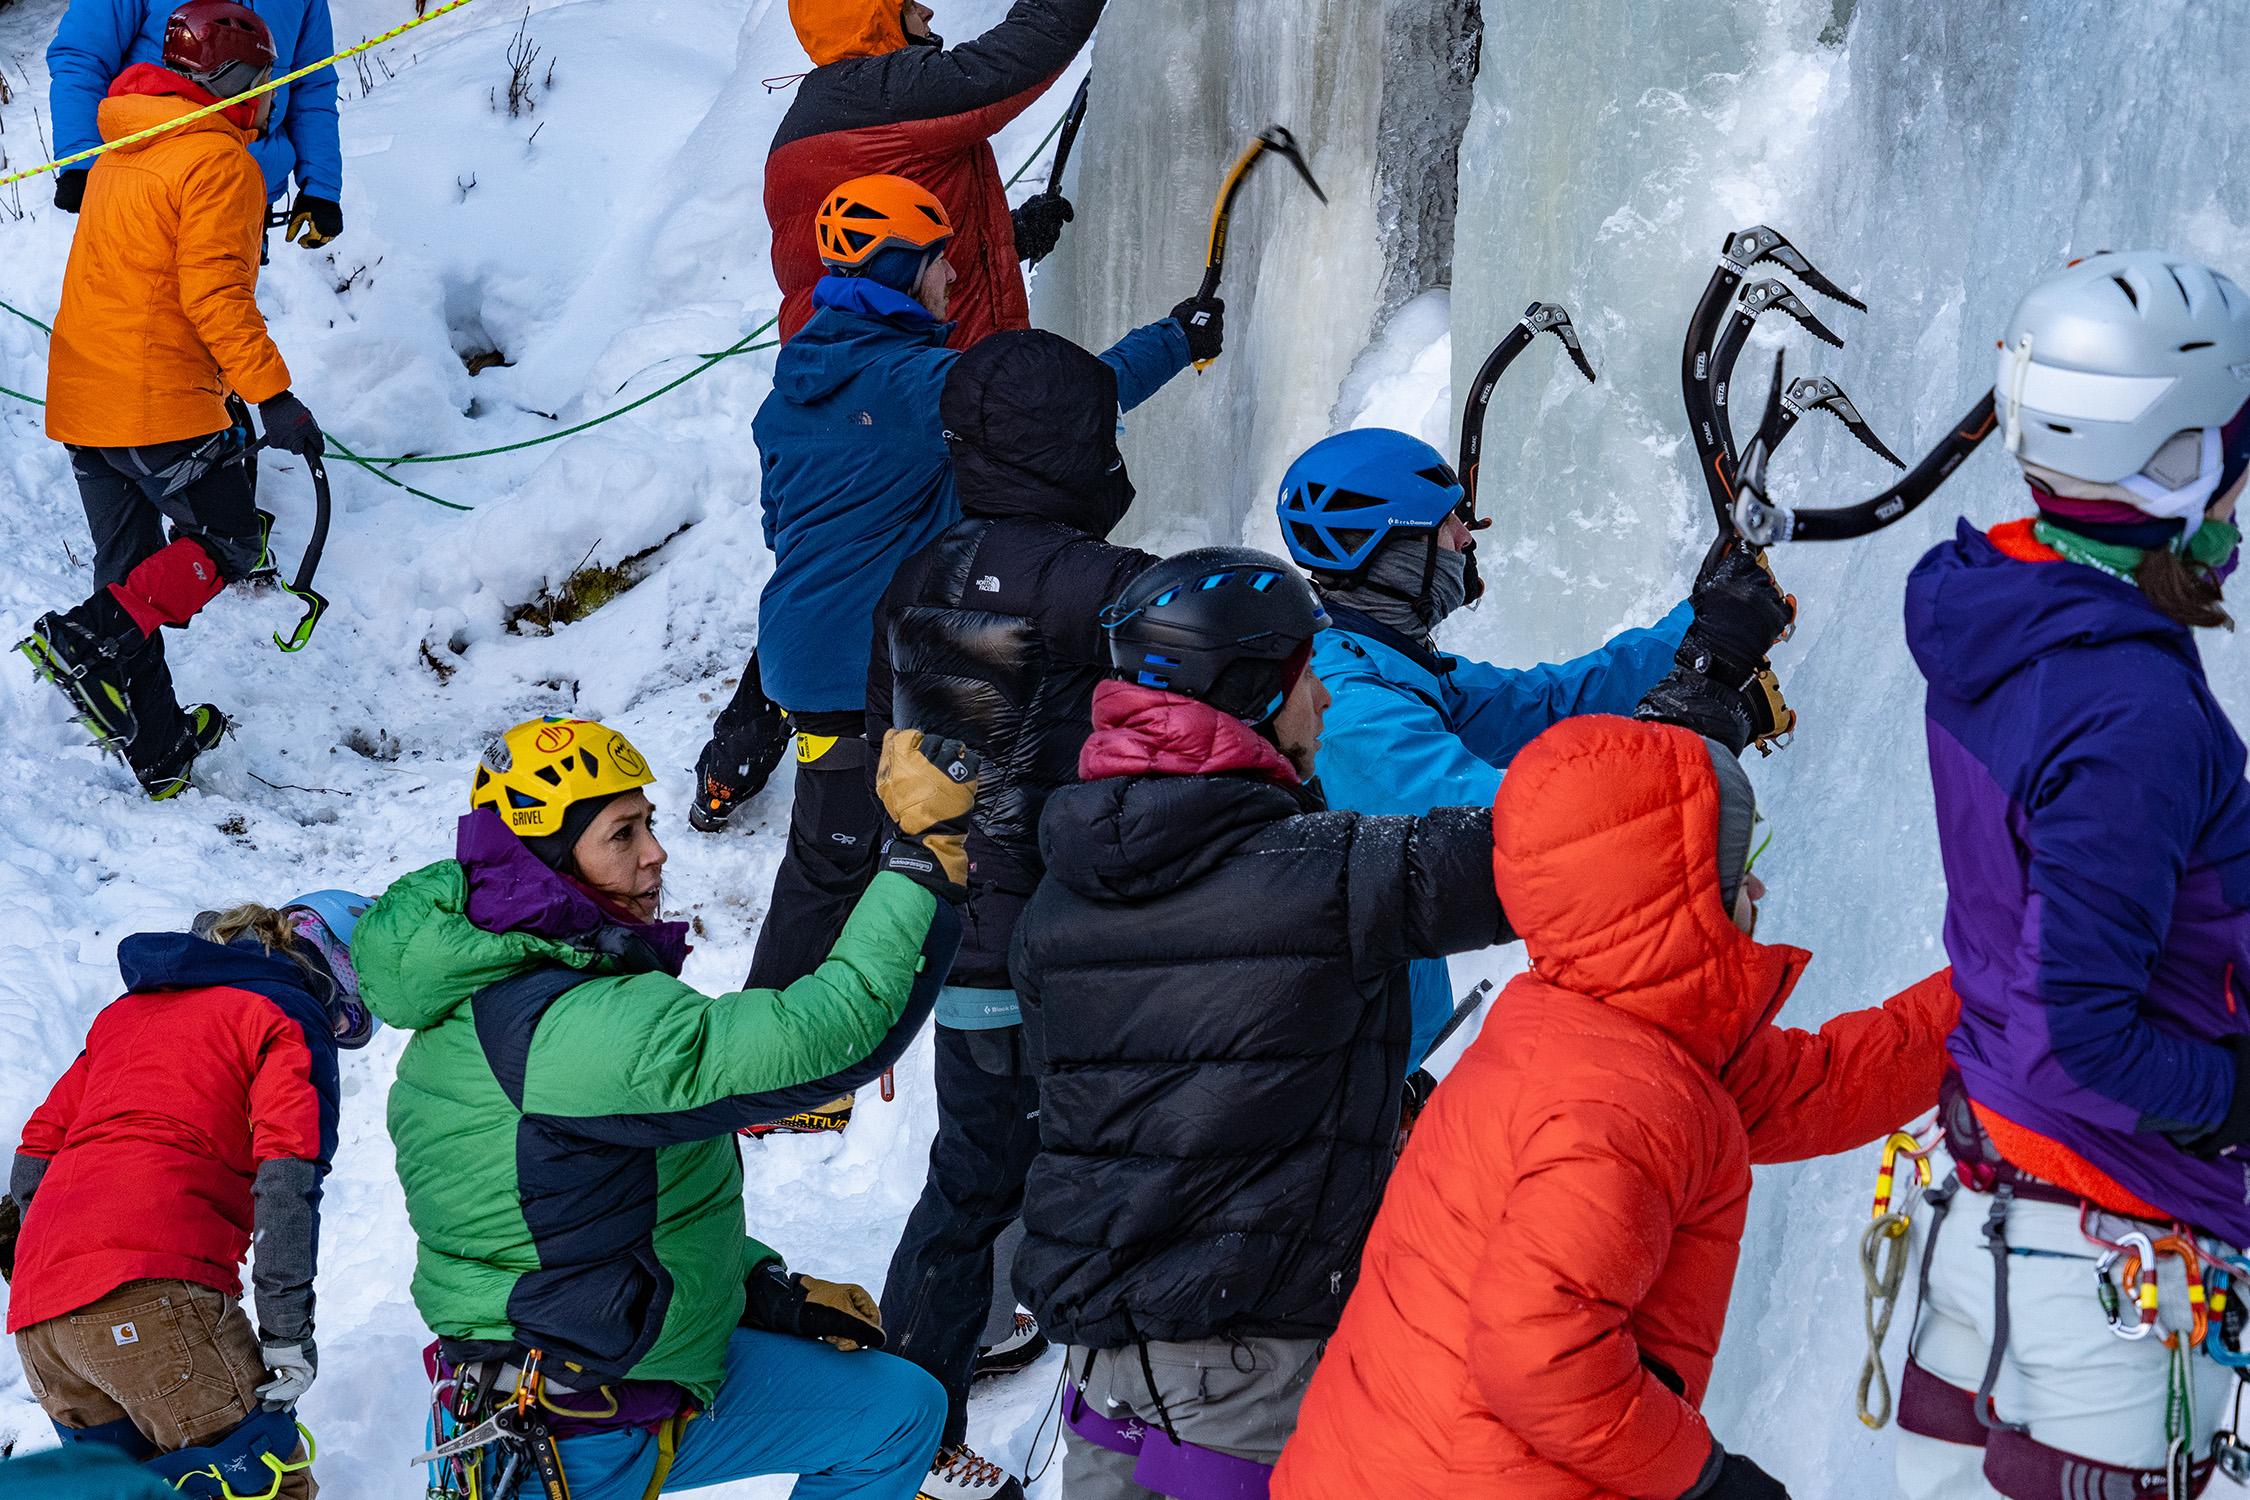 Nikki Smith teaching proper ice climbing technique. Photo credit Sarah Klintworth.